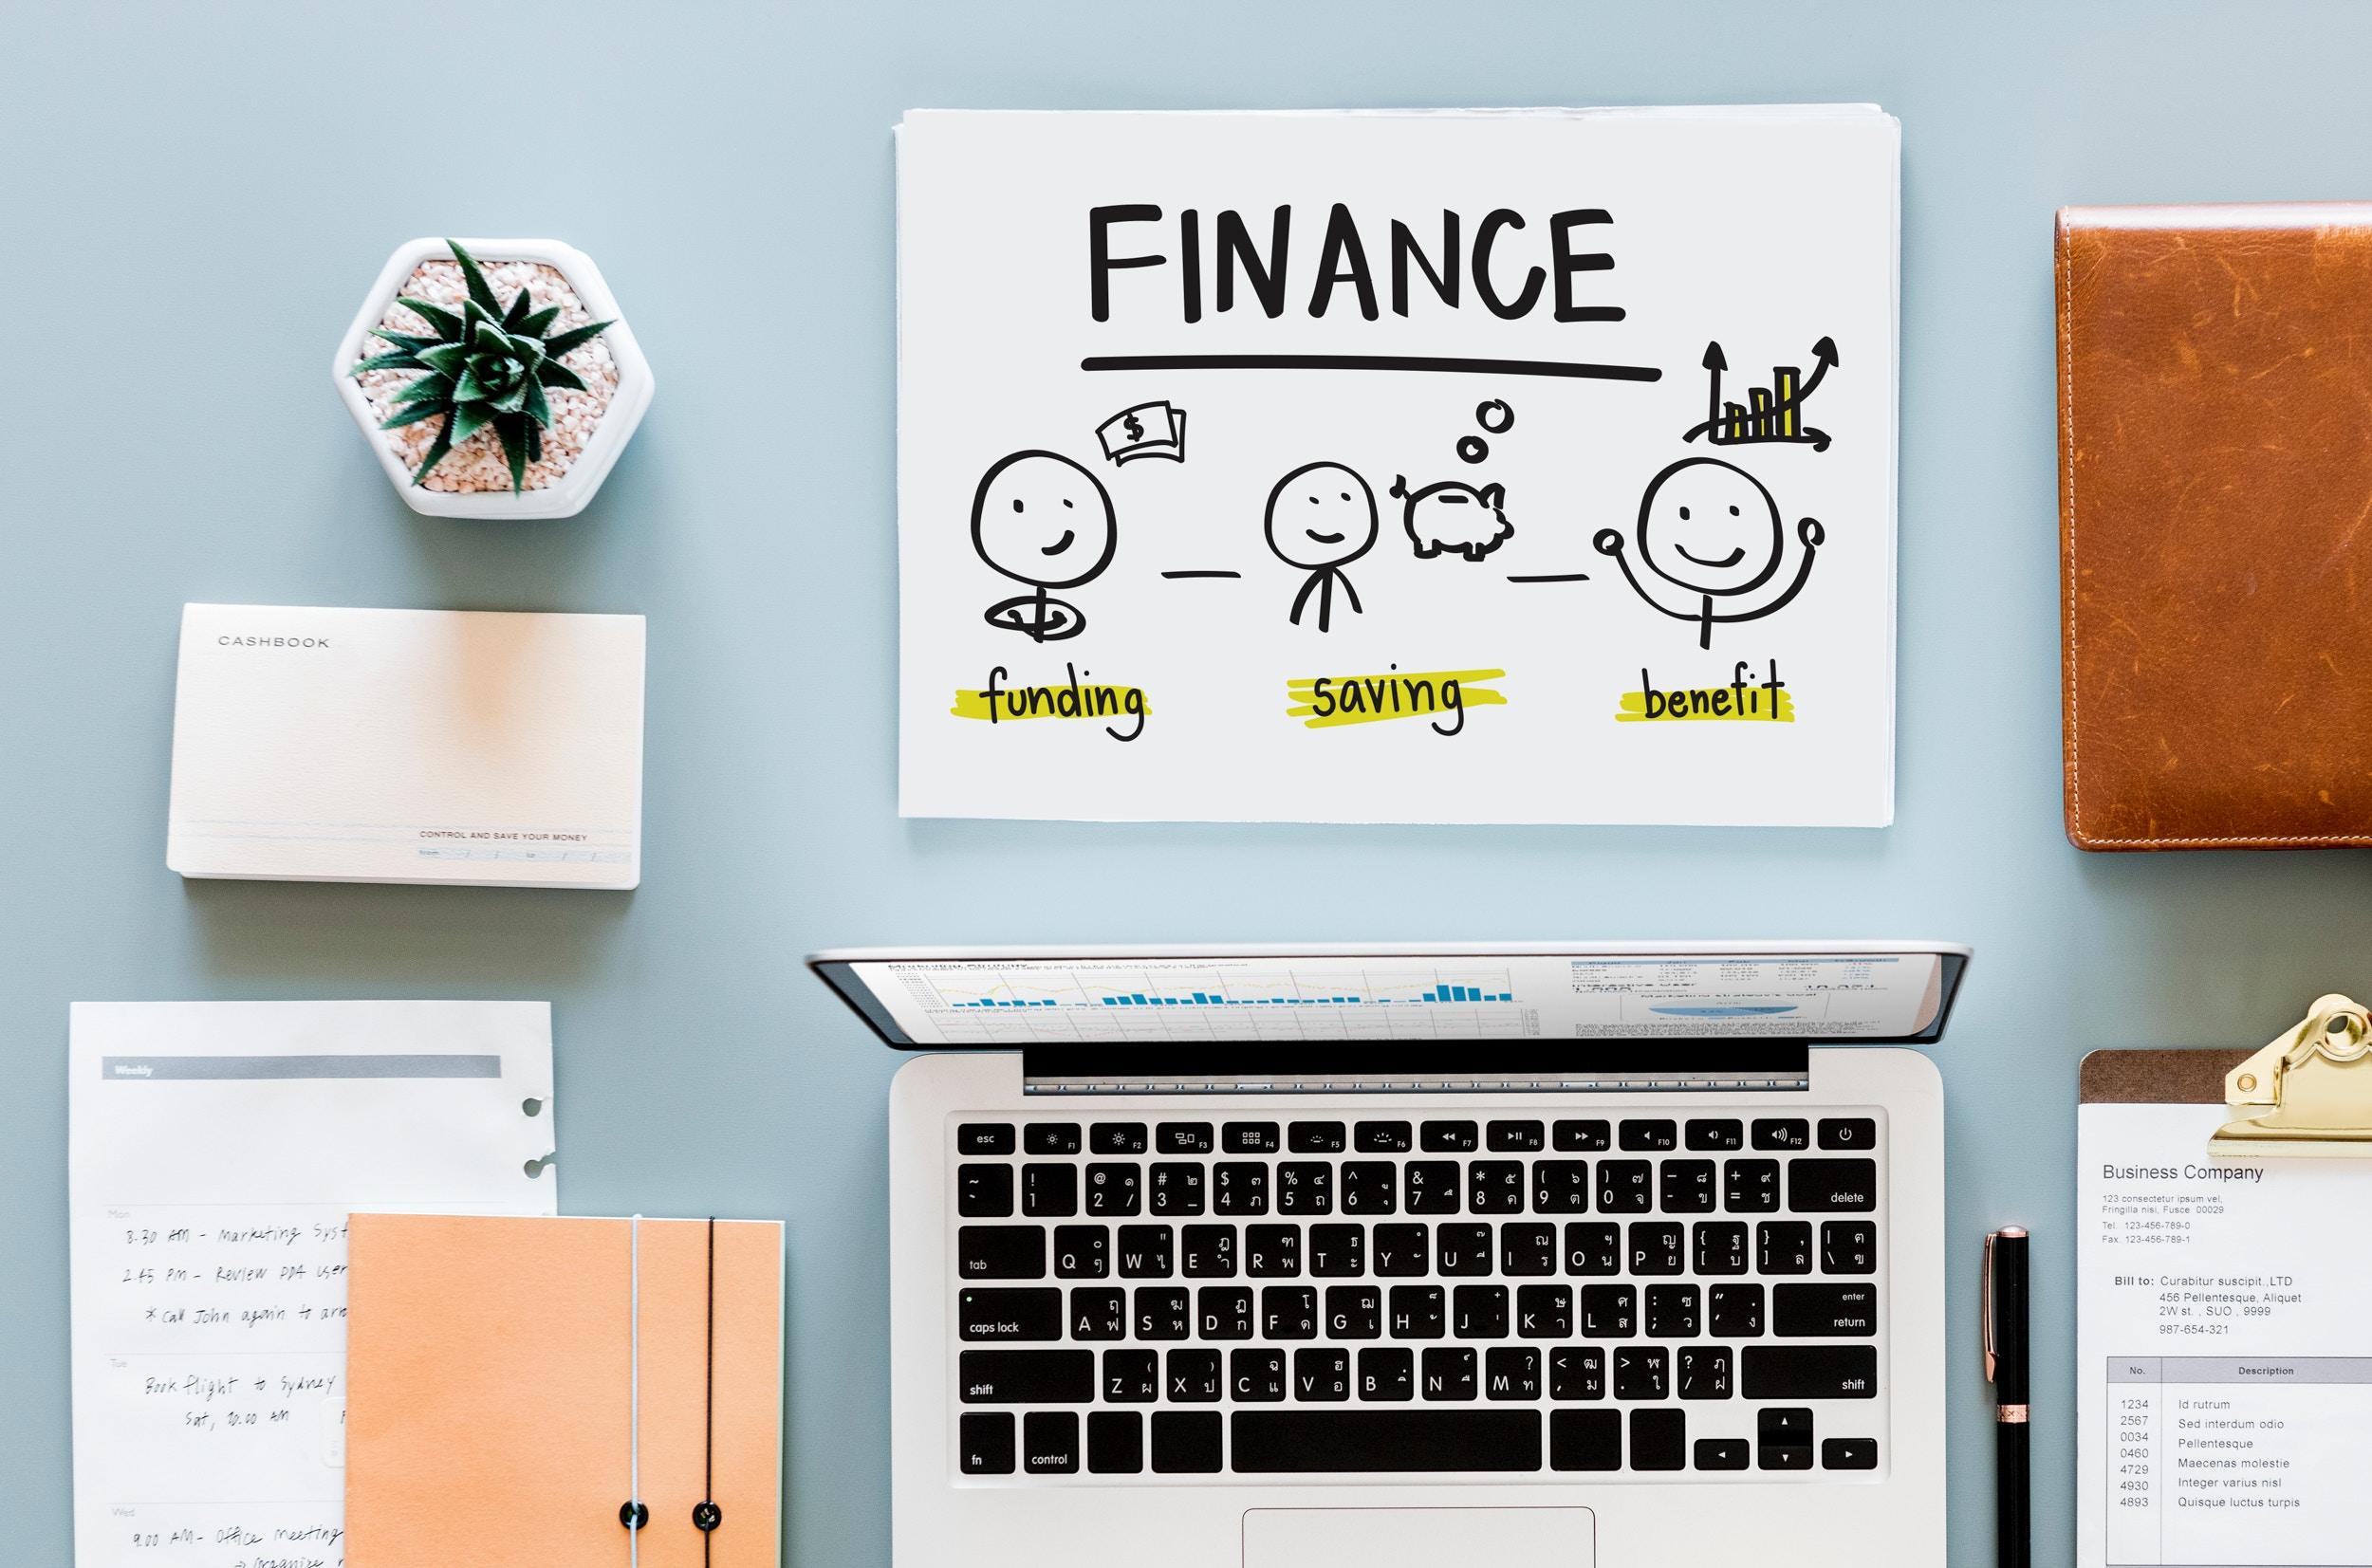 Finances-Spark-Joy-Blog.jpg